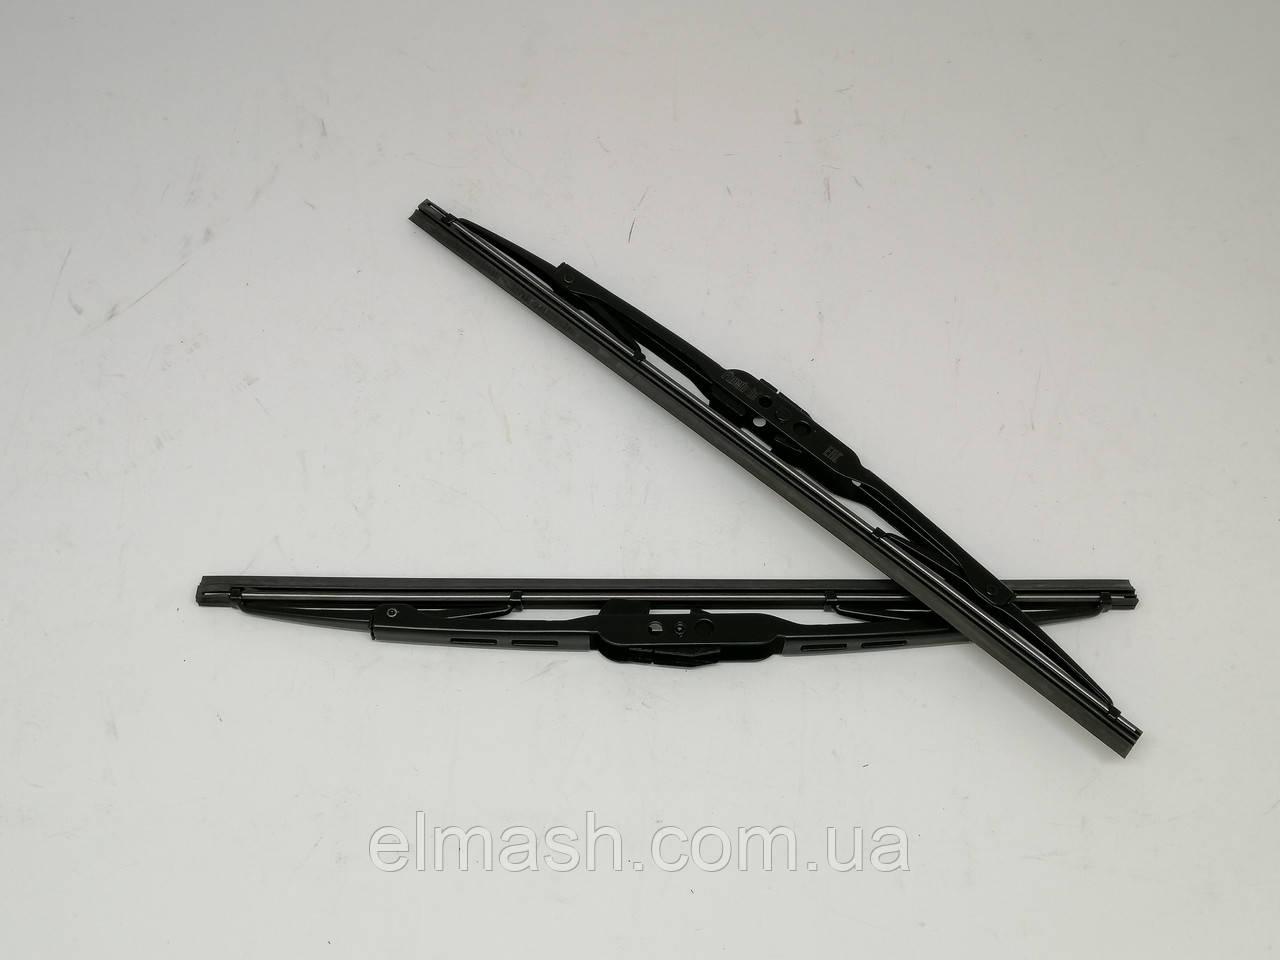 Щетка стеклоочистителя серия DOLPHIN ВАЗ 2101-07 330 мм в коробке комплект 2шт. FB13 (пр-во FINWHALE)